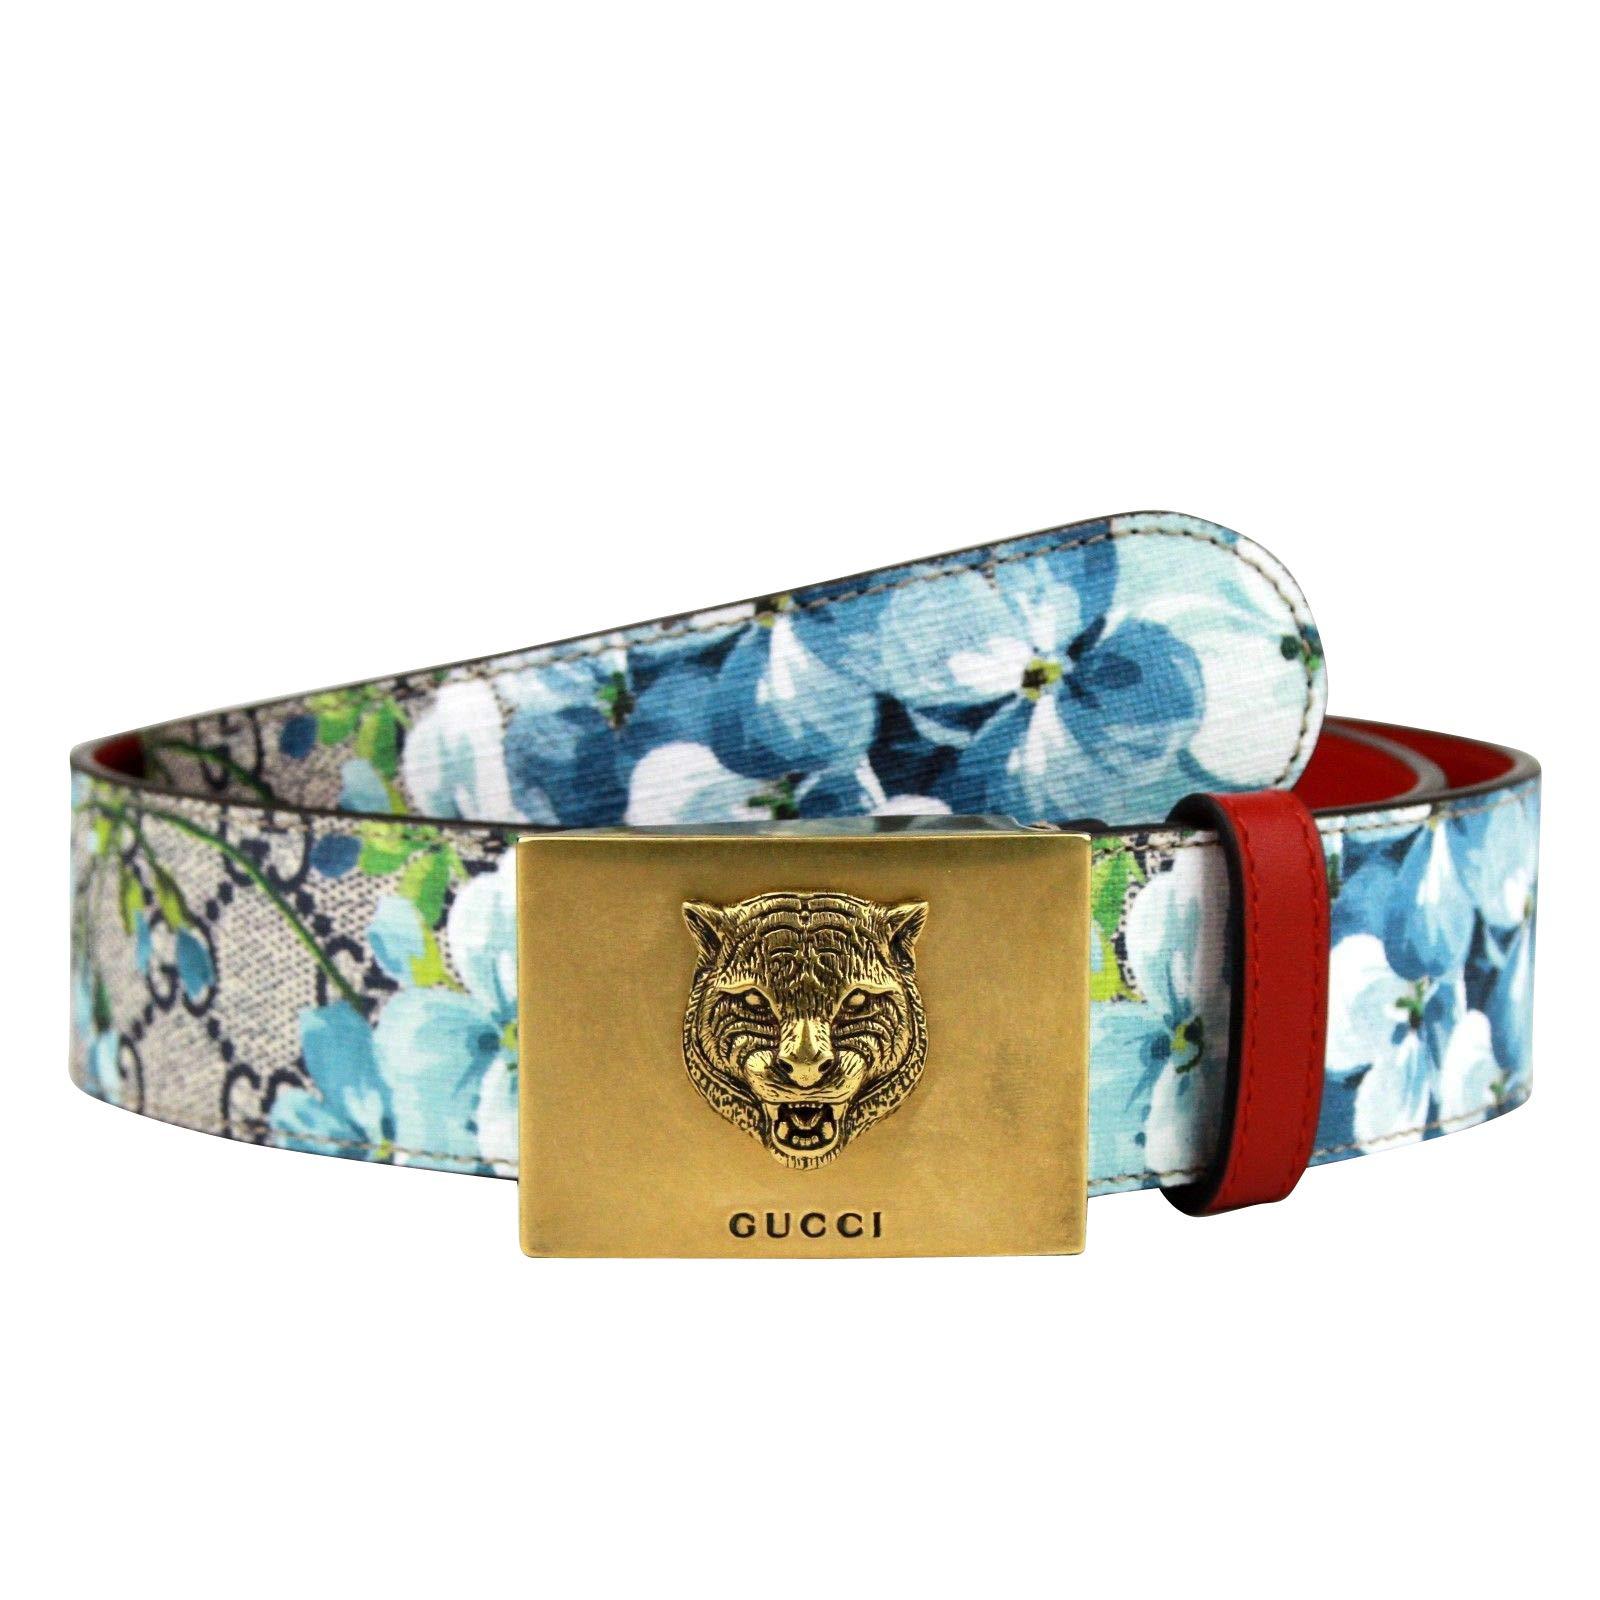 Gucci Unisex Gold Tiger Blue GG Supreme Coated Canvas Bloom Print Belt Buckle 434559 8492 (80/32)